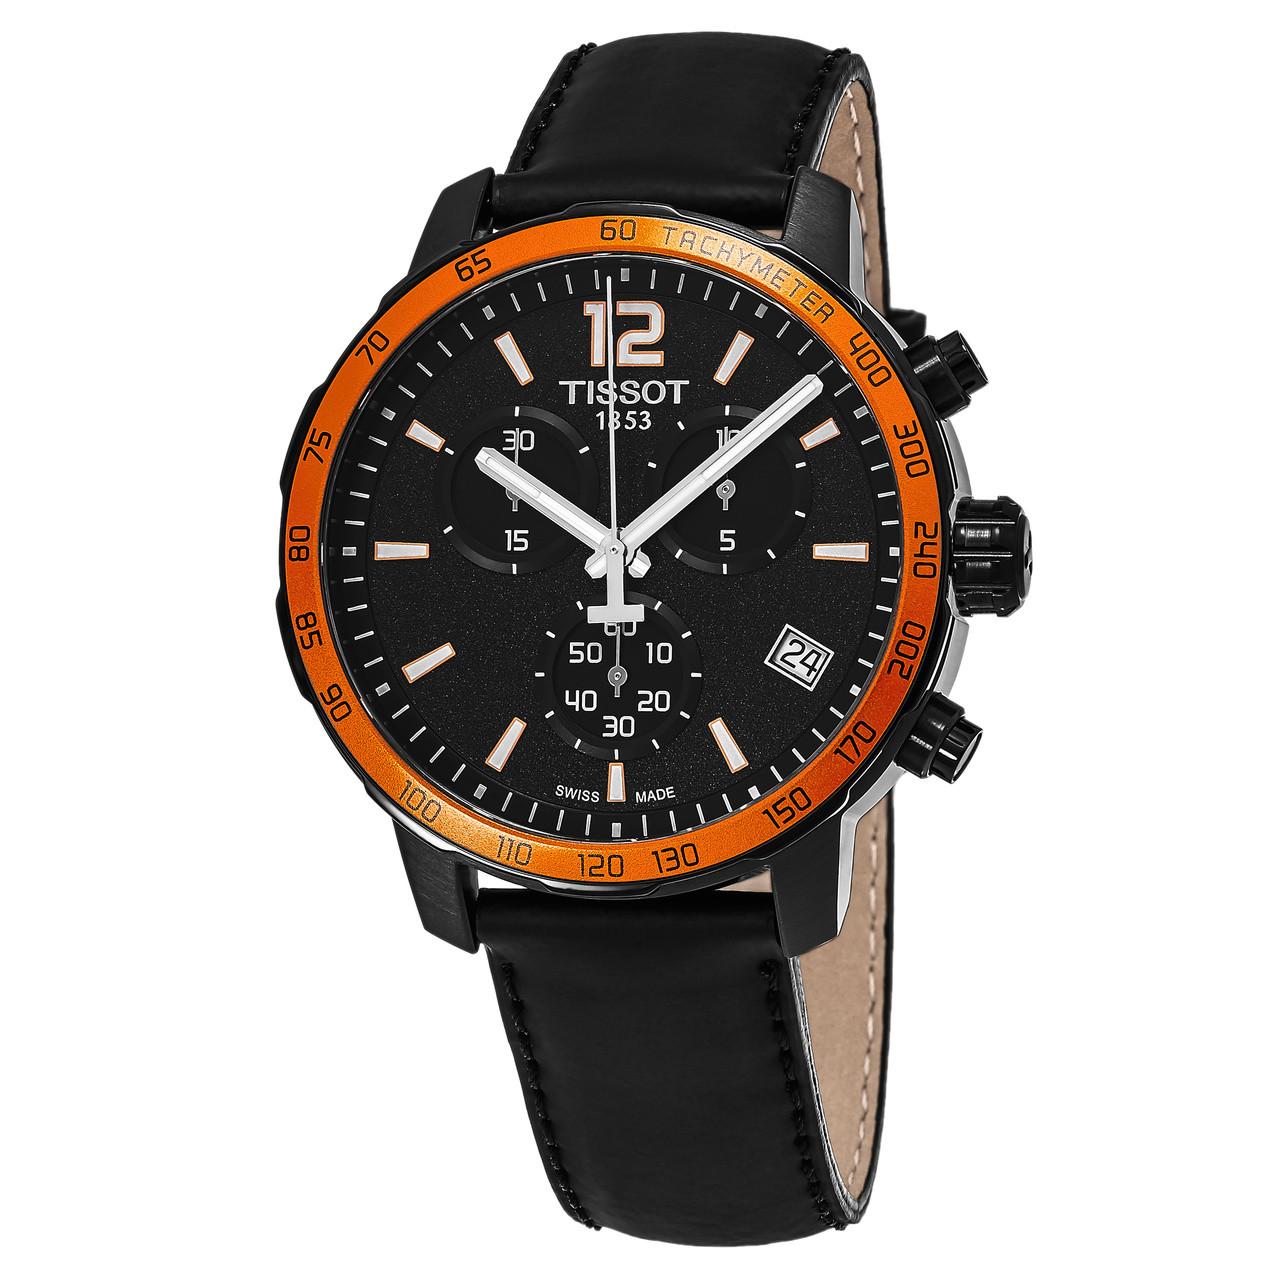 bdaad7bf4f4 Tissot Men's T095.417.36.057.01 Quickster Chronograph Swiss Quartz Watch -  Sigmatime